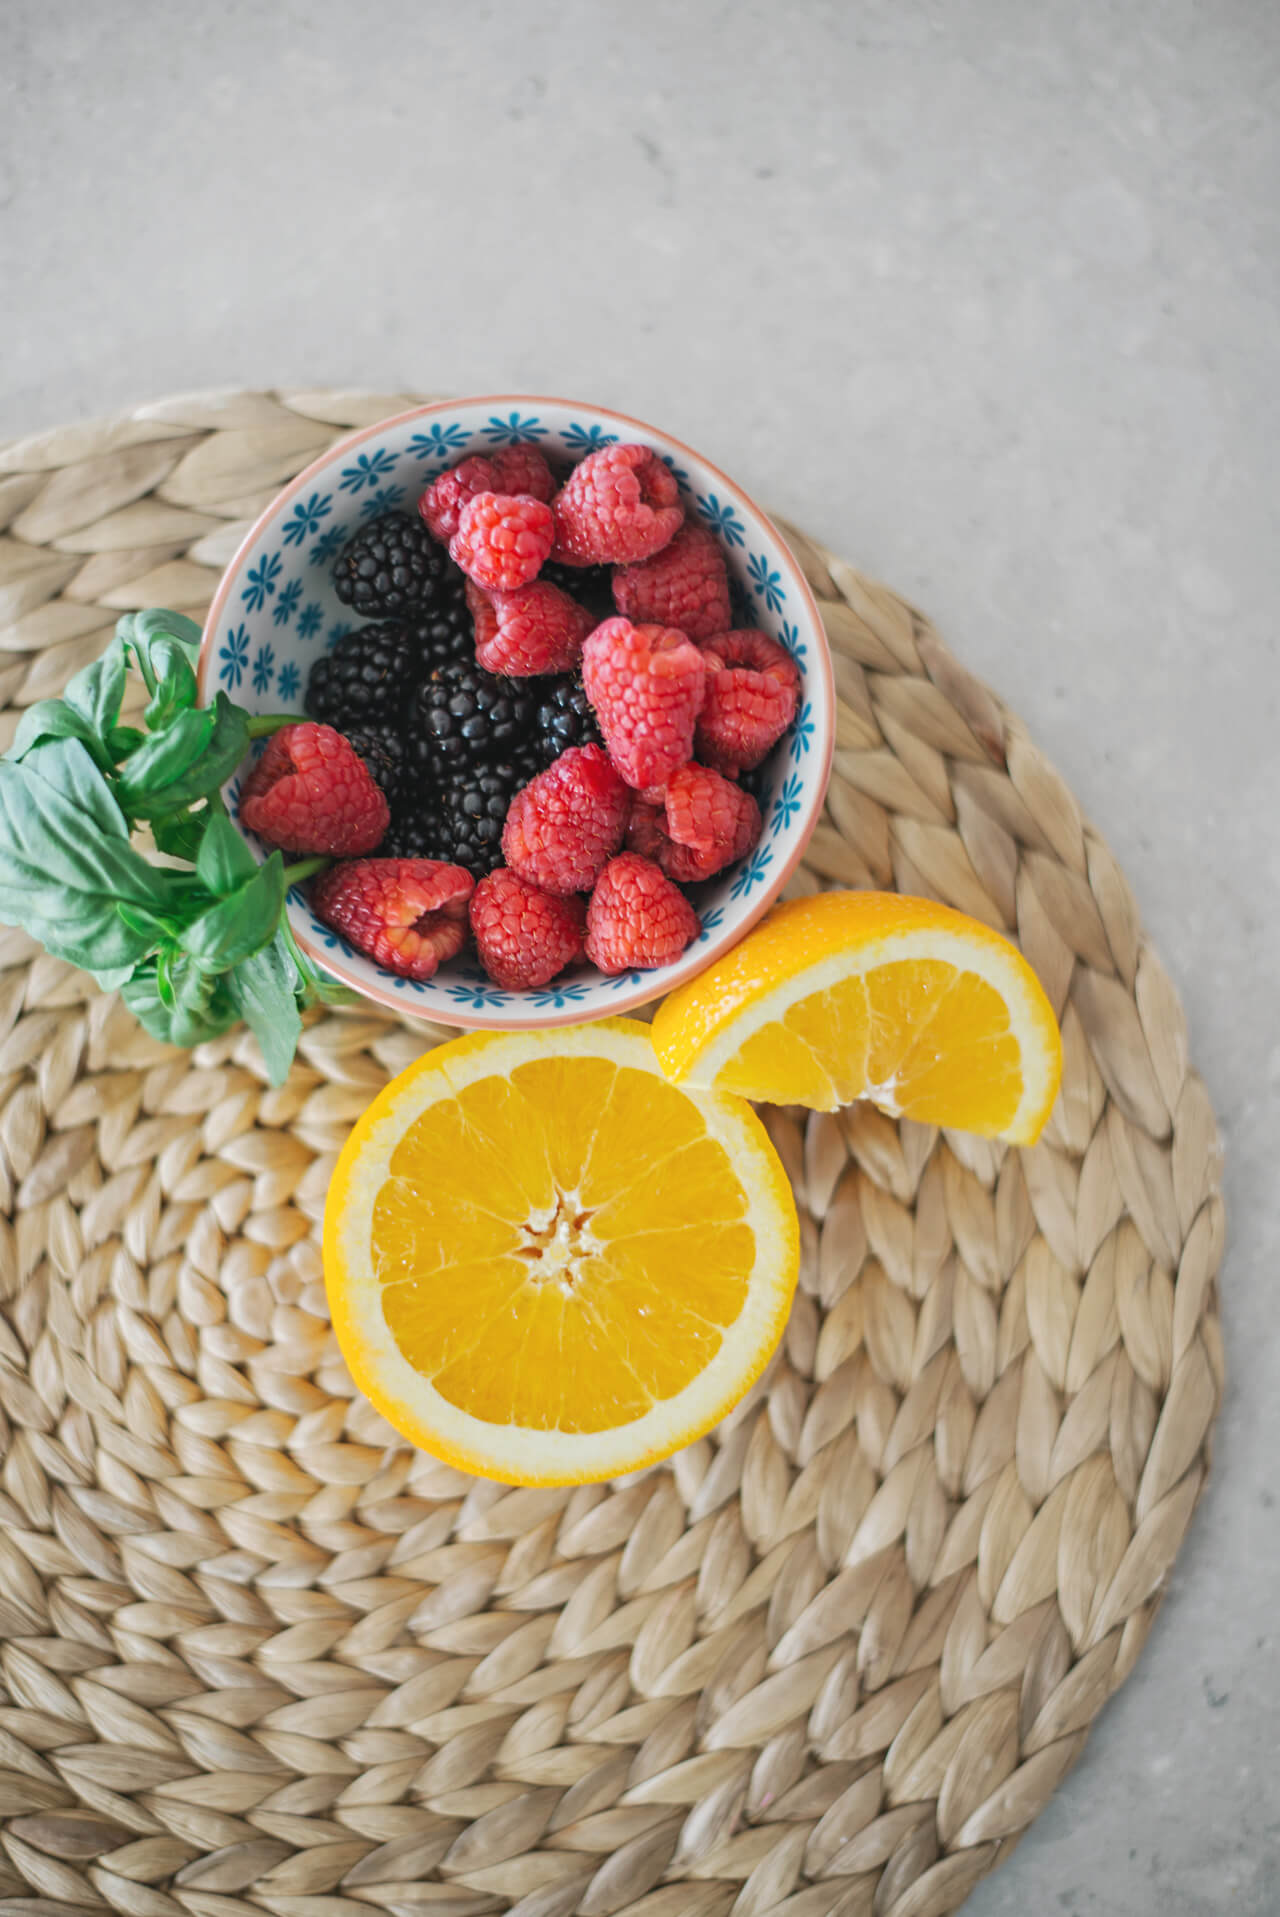 antioxidant rich fruits